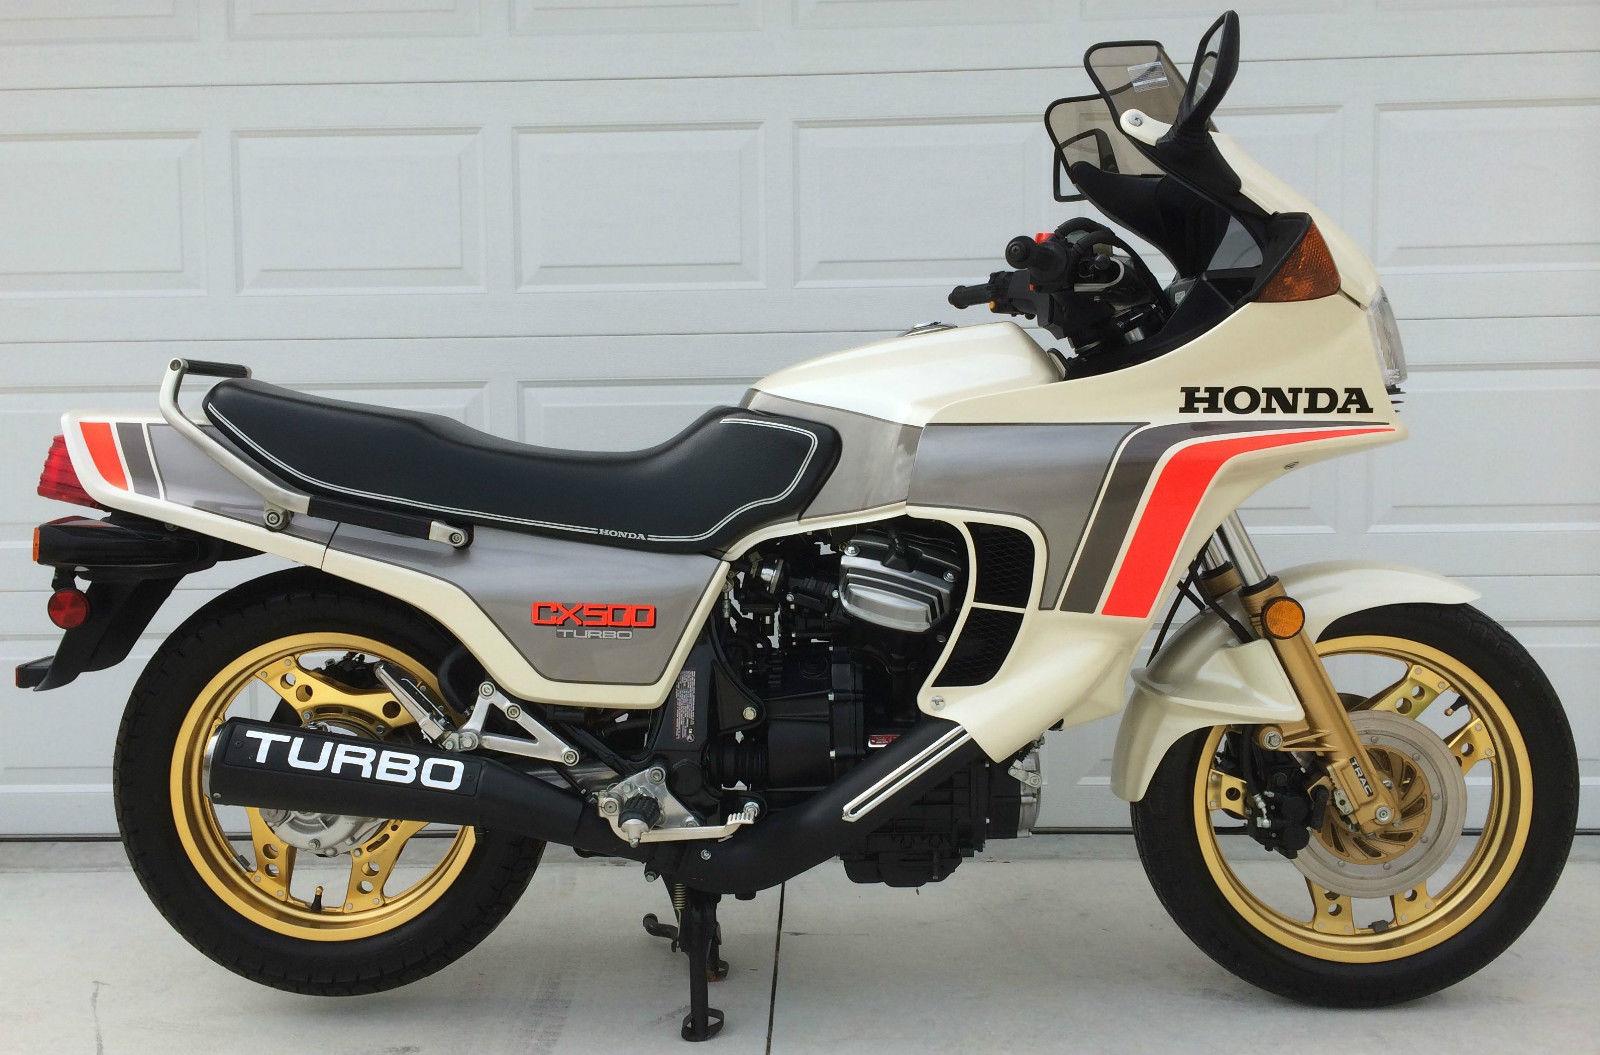 190 Miles 1982 Honda Cx500 Turbo Bike Urious